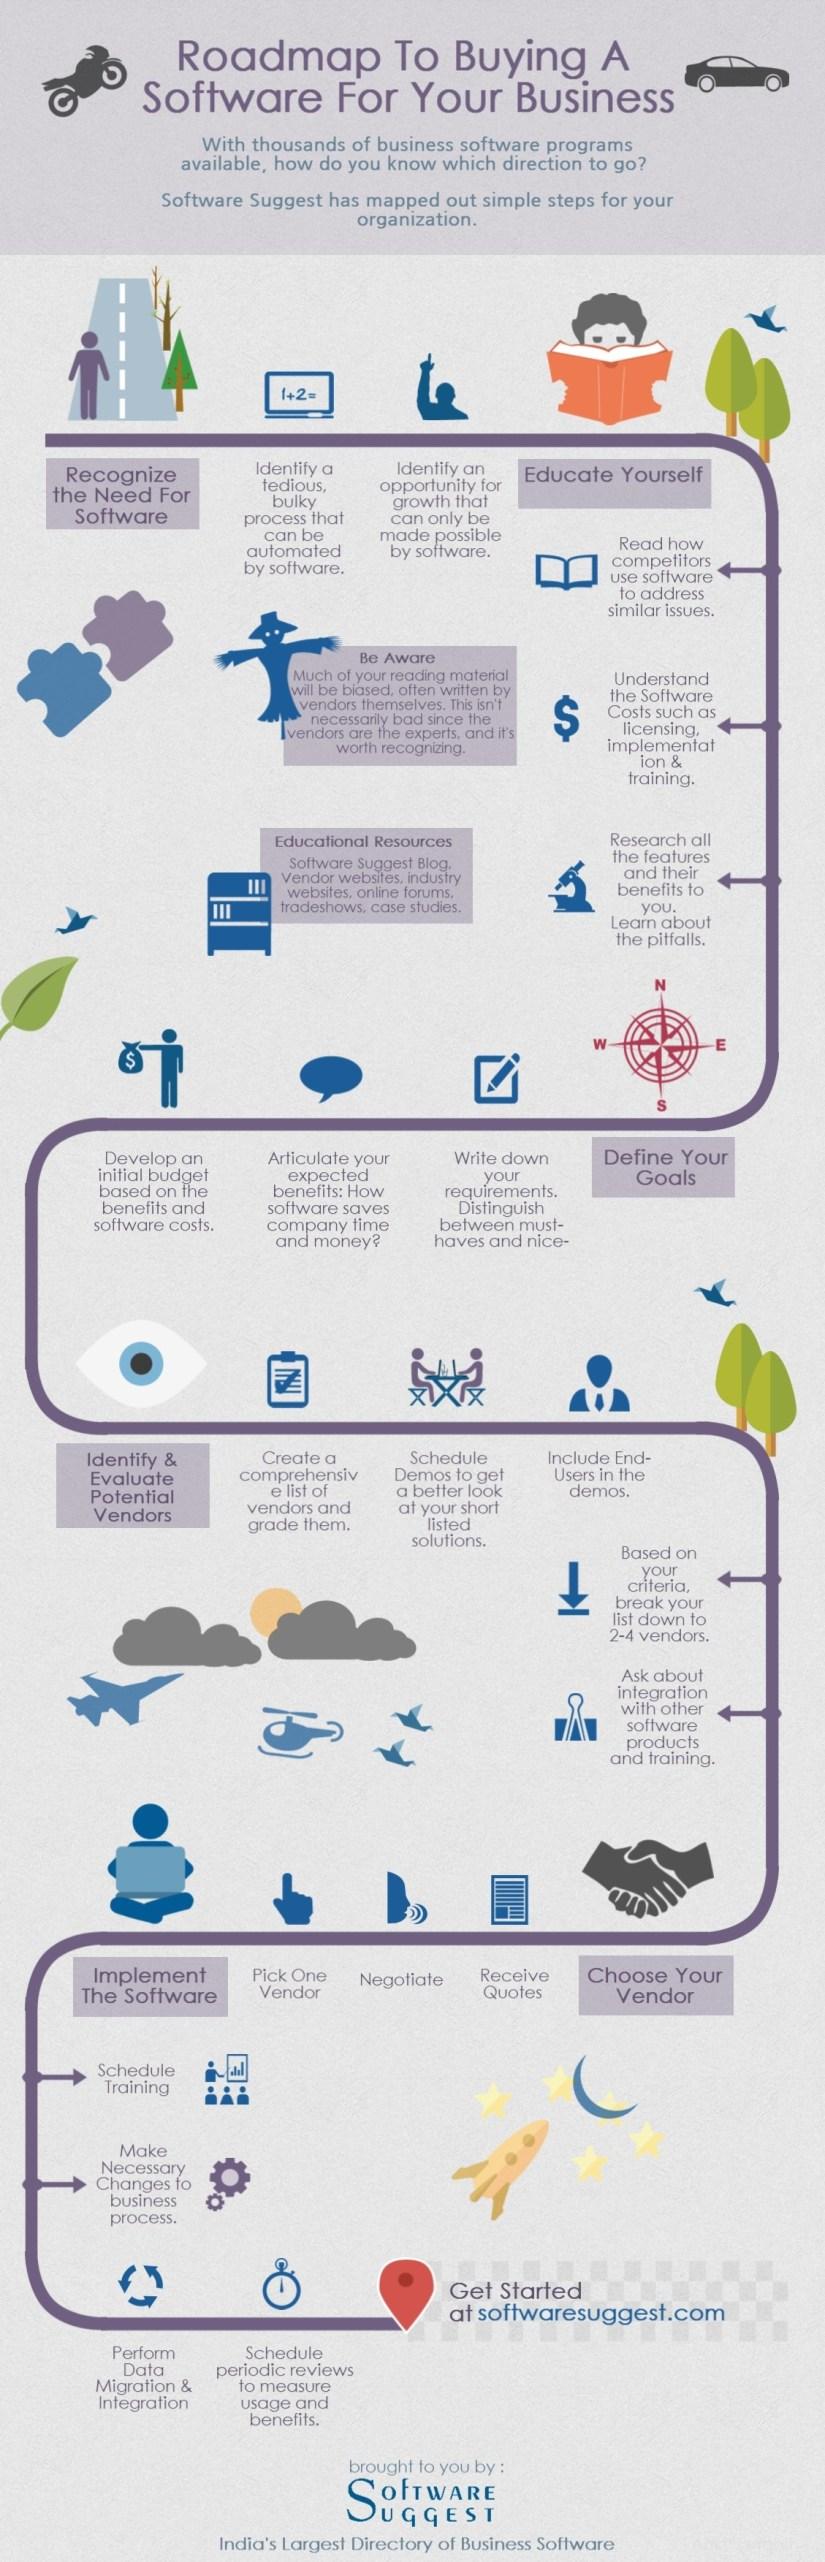 Software-Buying-Roadmap_HQ-SoftwareSuggest